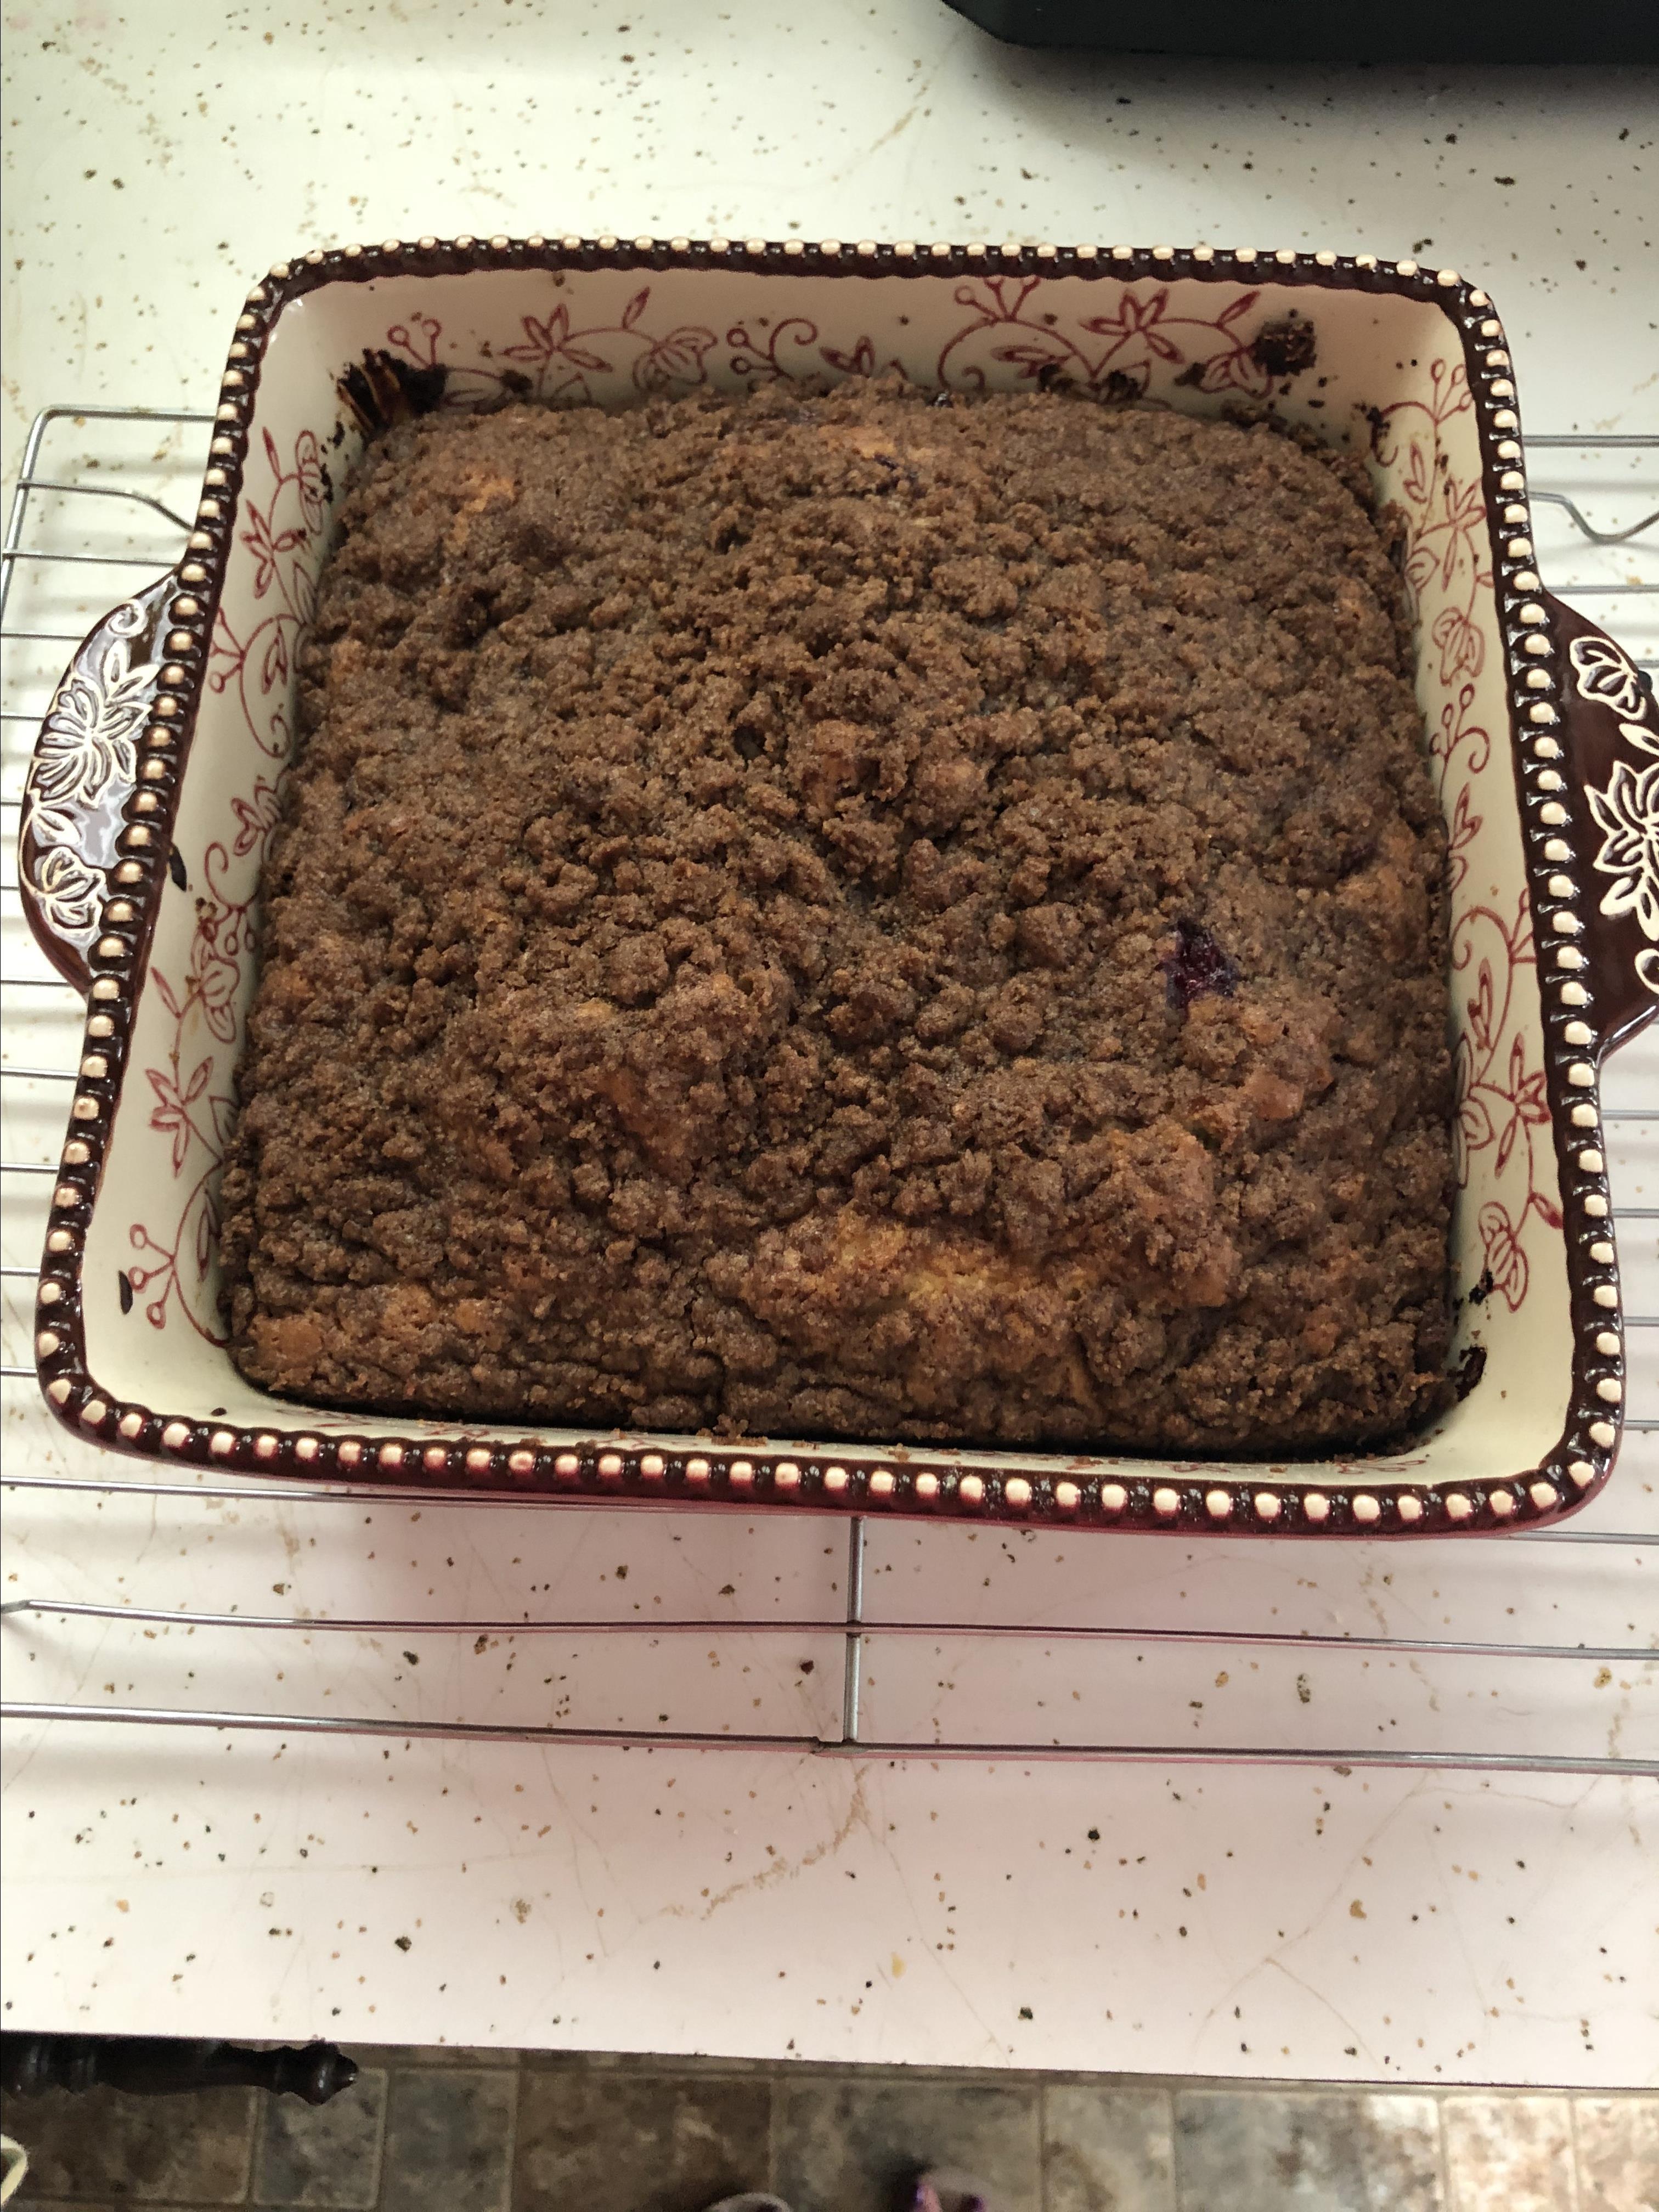 Blueberry Muffin Cake Christine F.